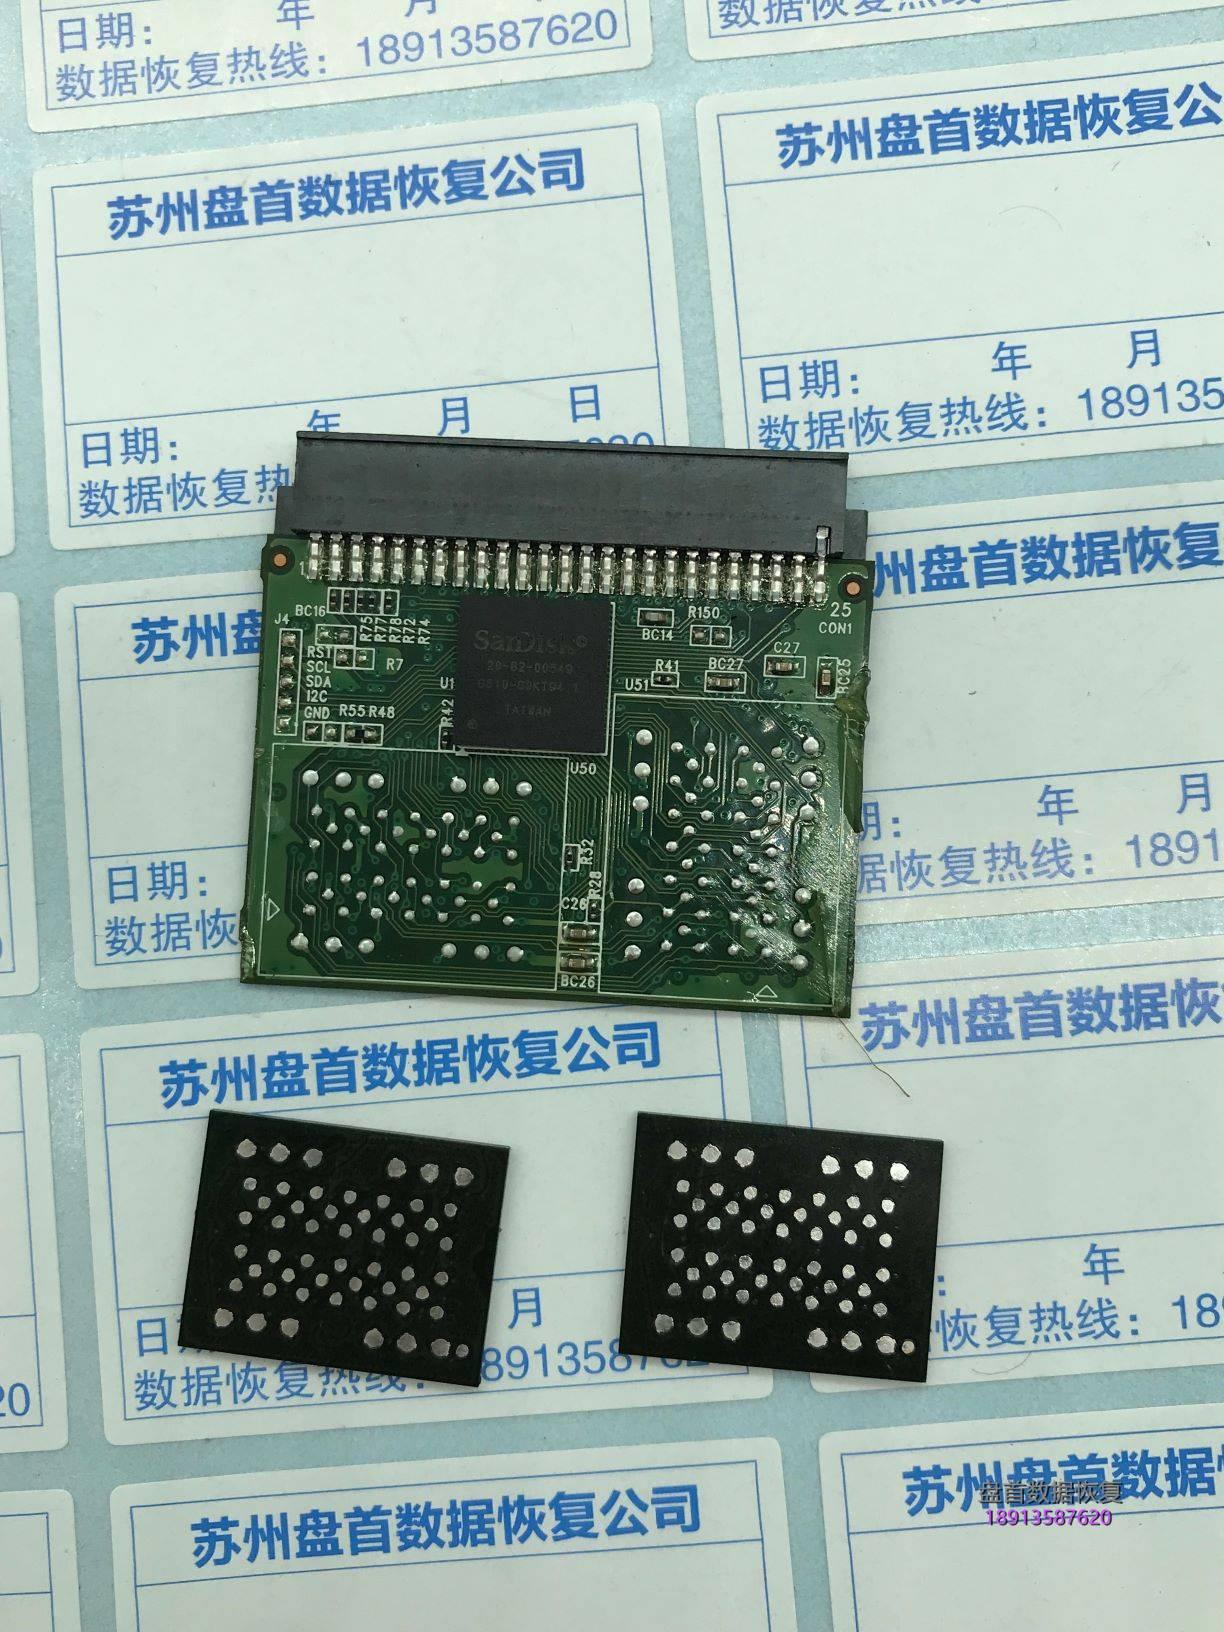 0-8 SanDisk闪迪64GCF卡显示64M主控20-82-00549芯片级数据恢复成功